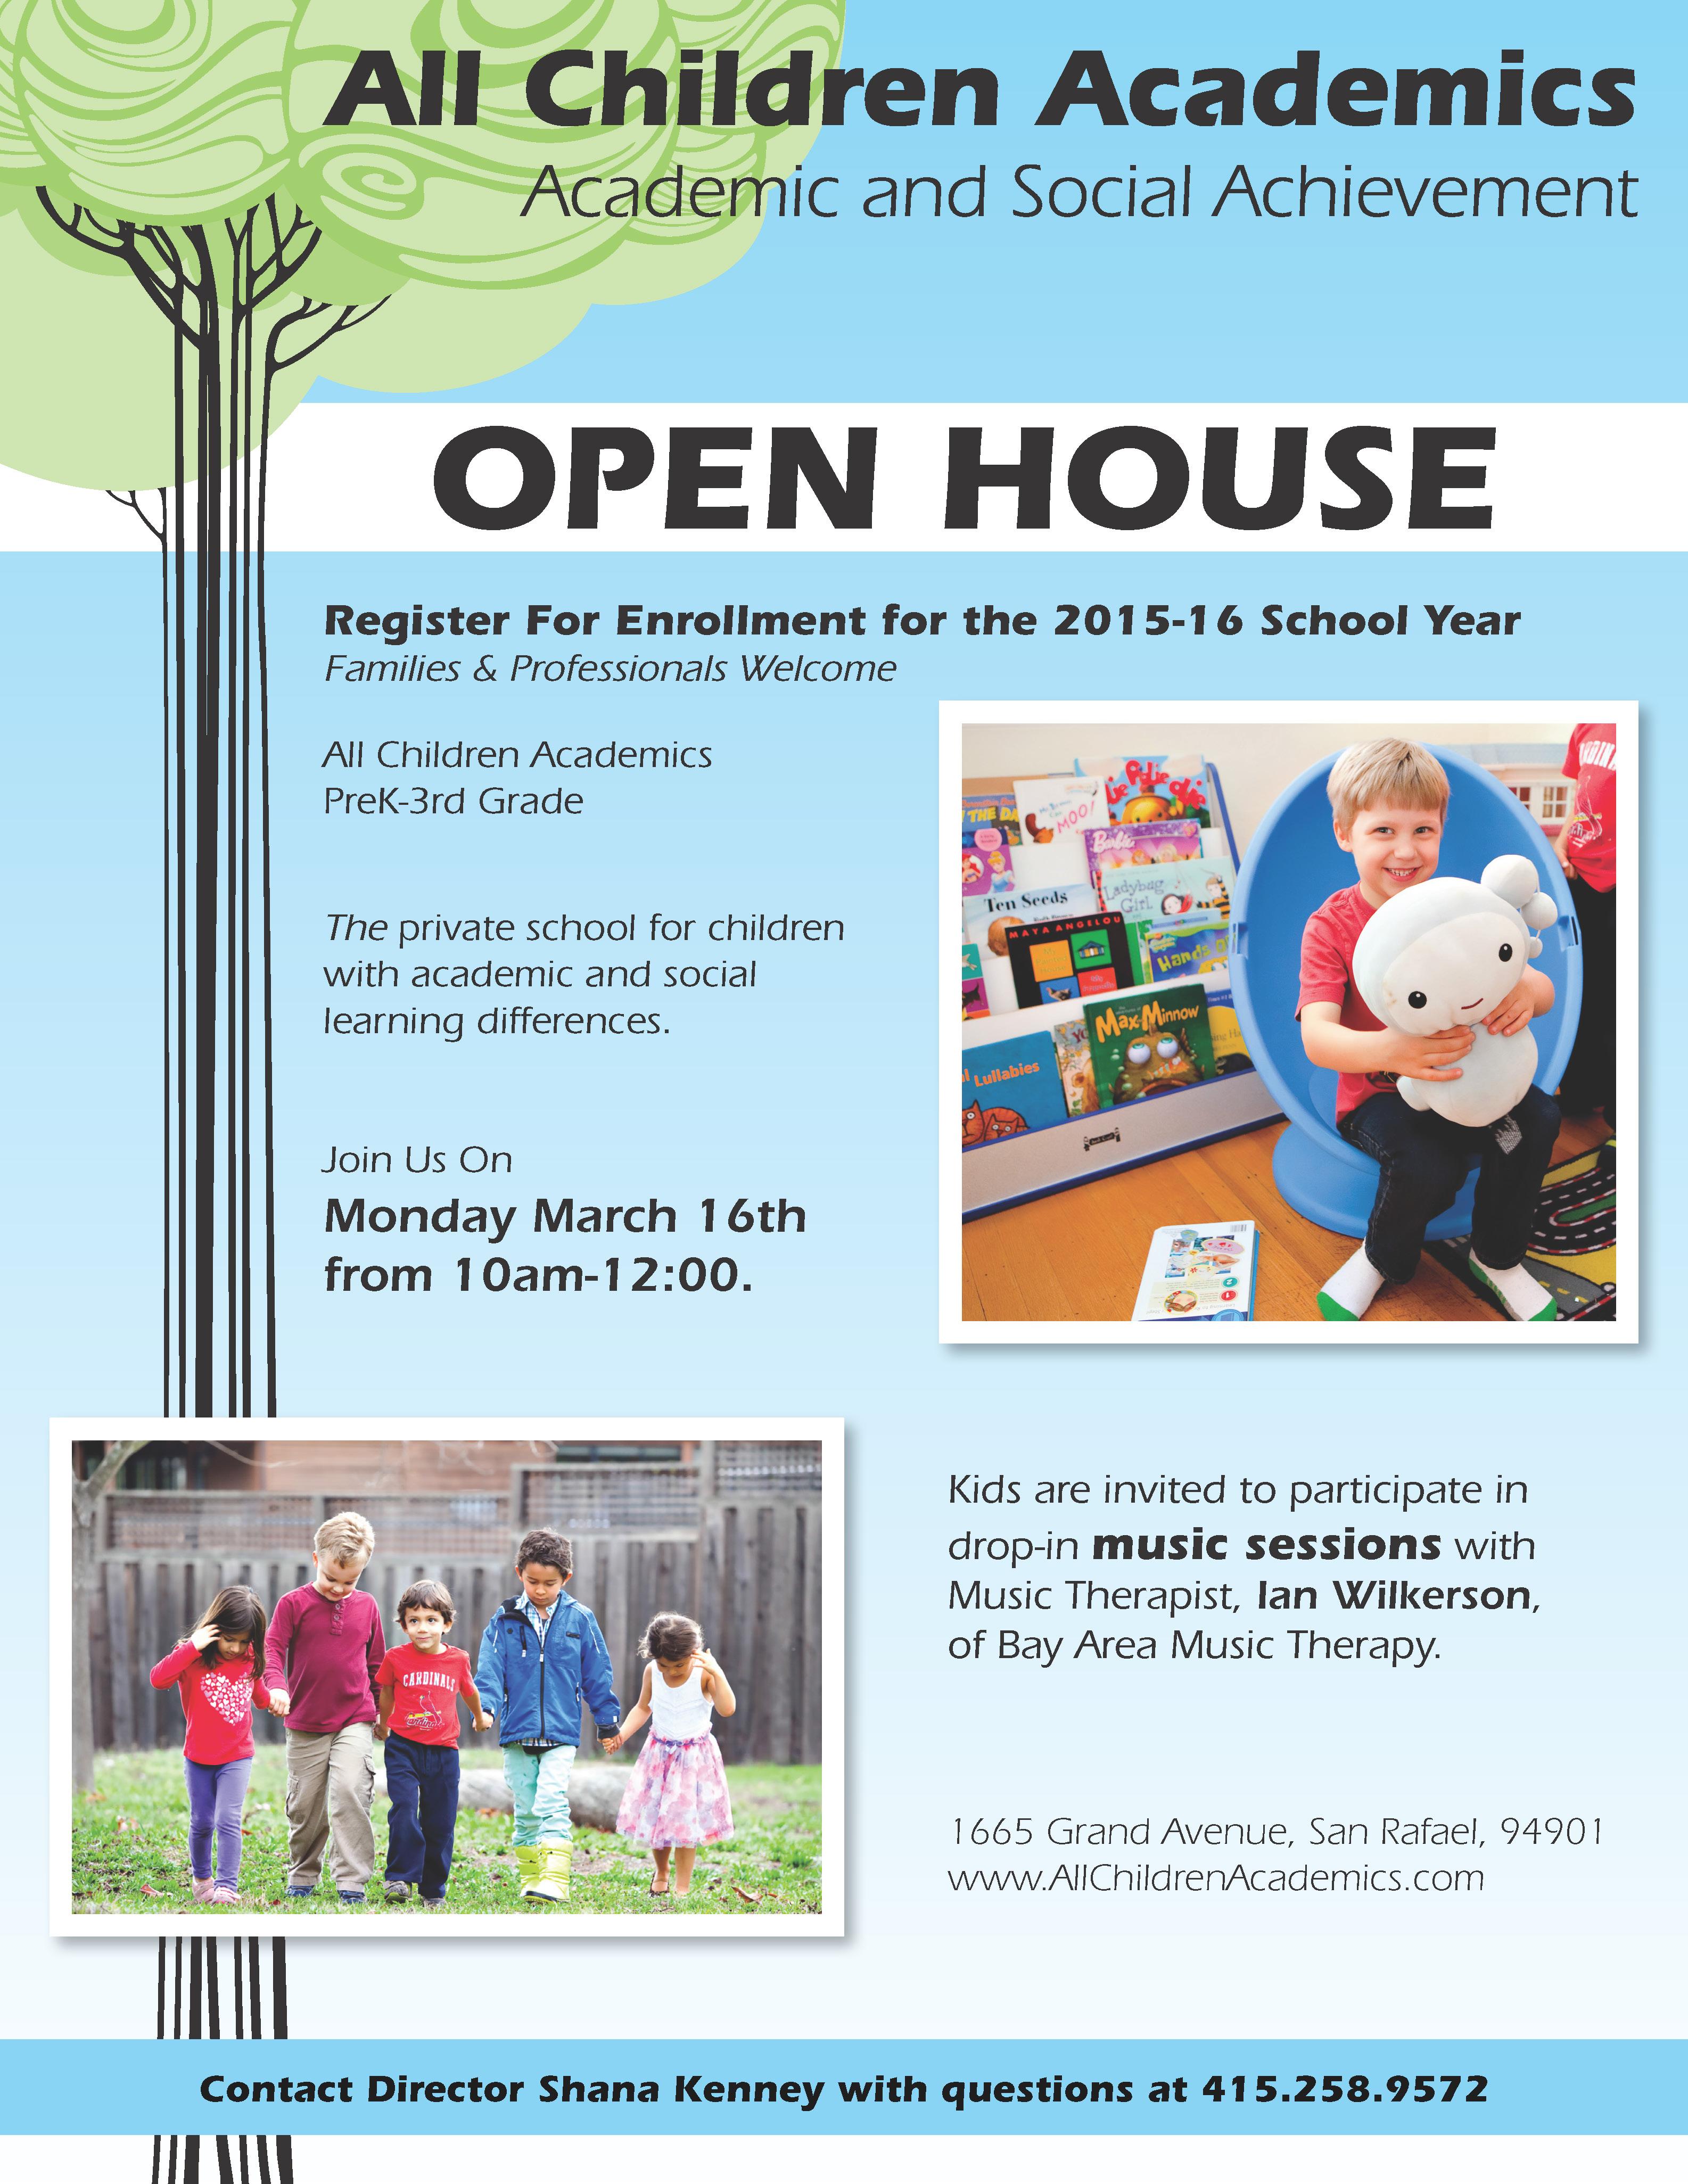 Open House at All Children Academics in San Rafael